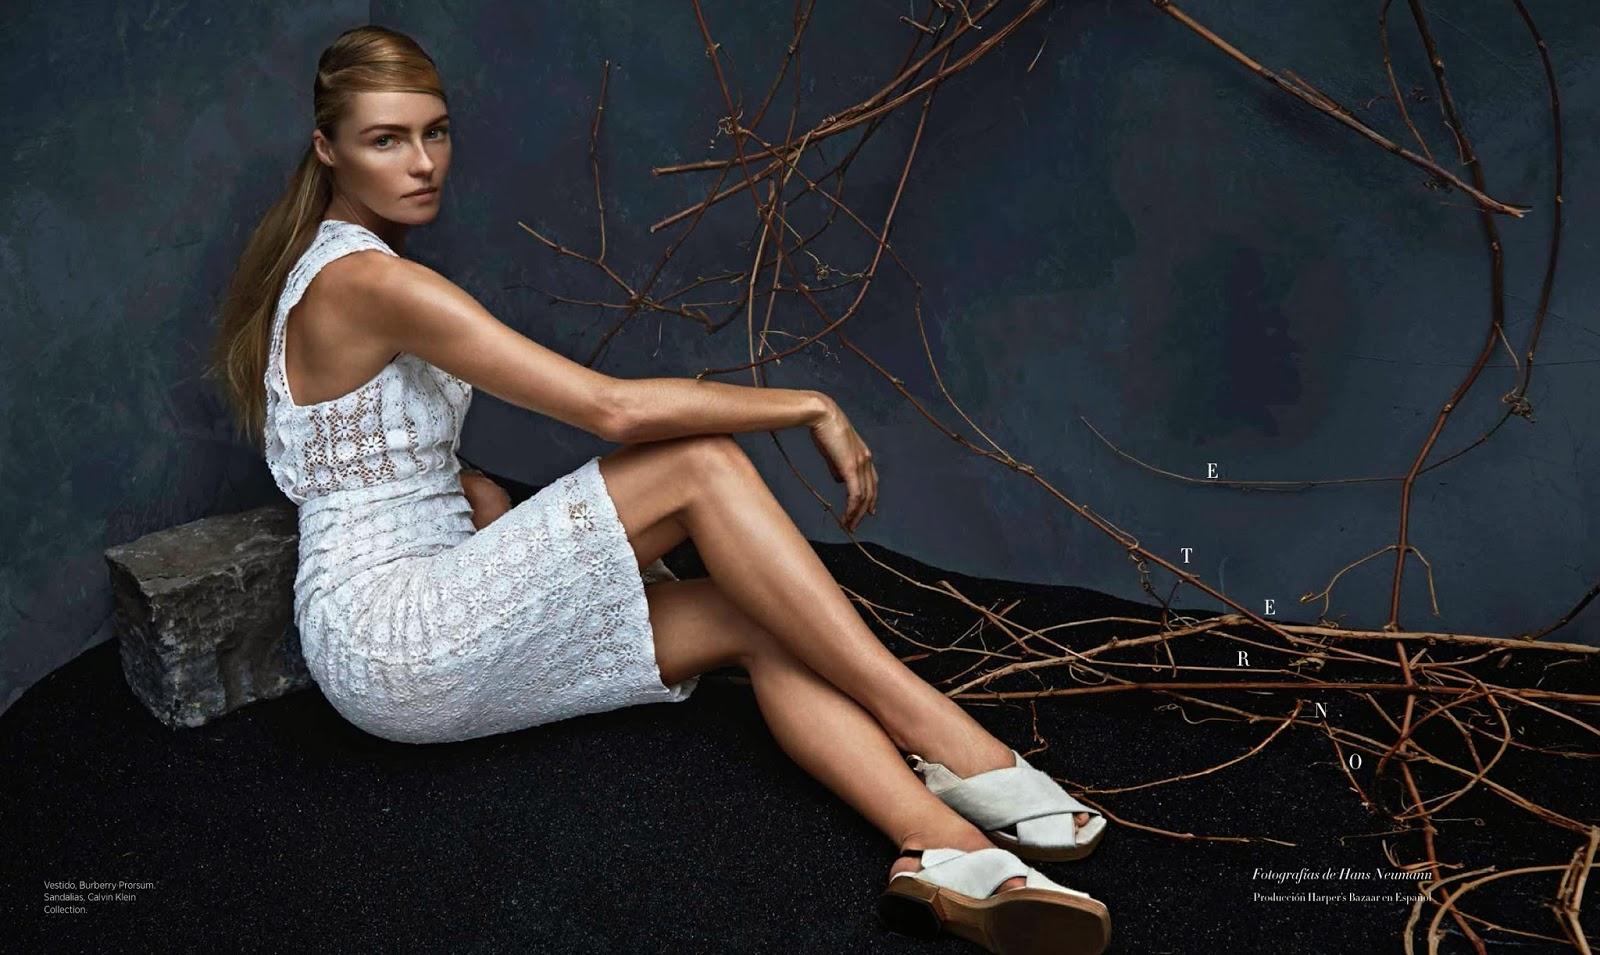 fashion_scans_remastered-valentina_zelyaeva-harpers_bazaar_en_espanol-january_2014-scanned_by_vampirehorde-hq-3.jpg